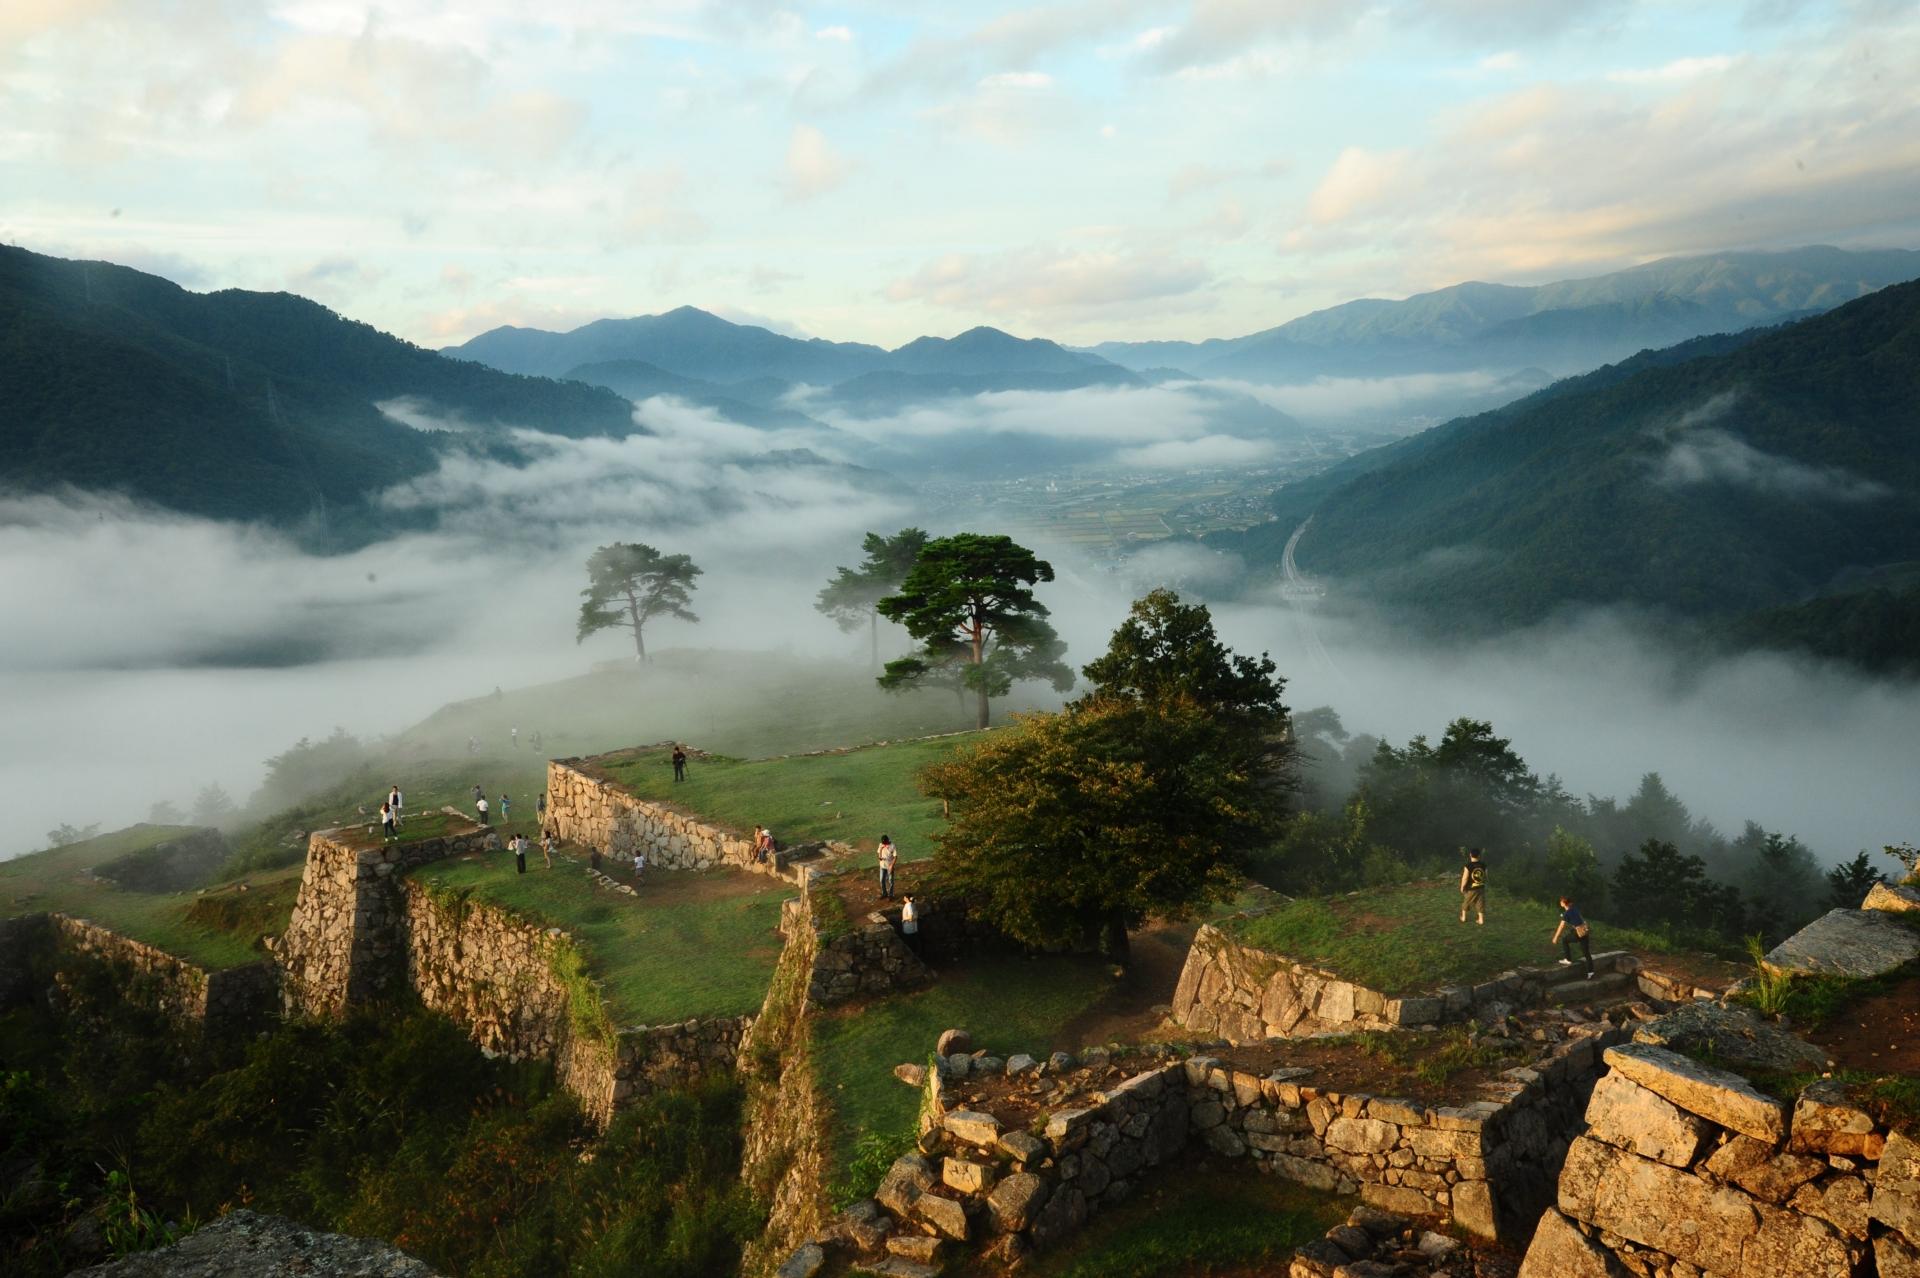 1224689_m 兵庫県 竹田城(雲海に包まれる秋におすすめの絶景写真スポット!アクセス情報や雲海の発生条件など)